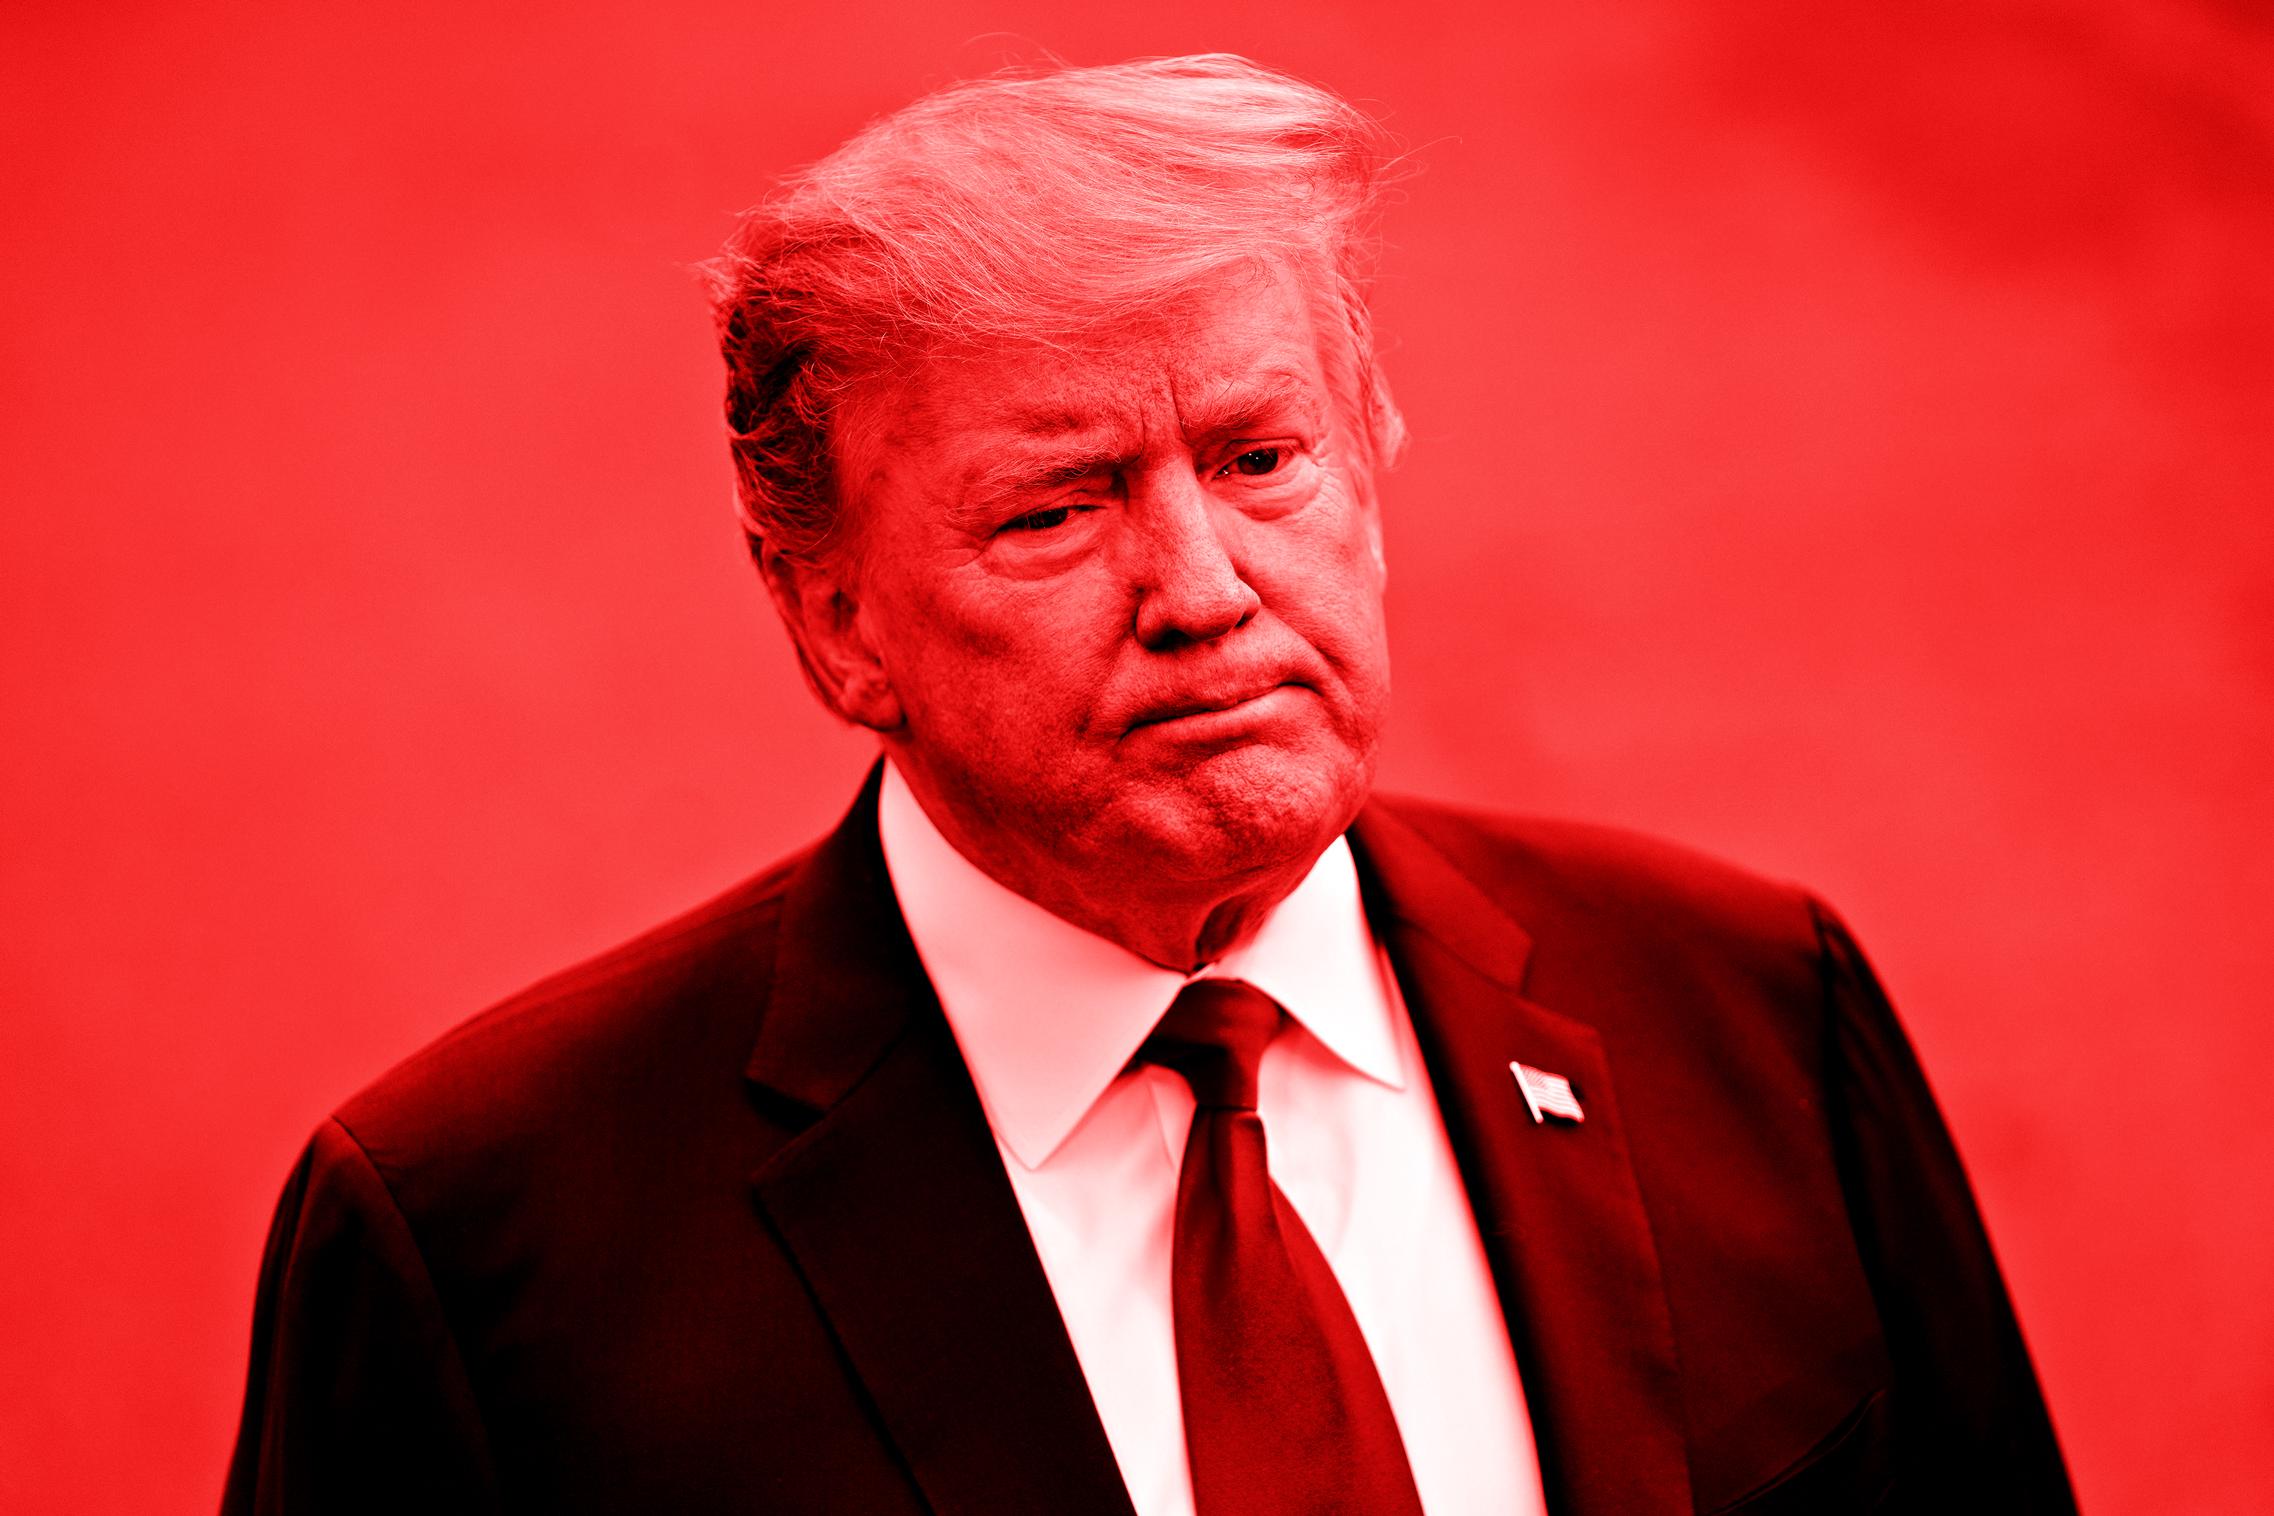 Trump slams Fox News (yes, Fox News)